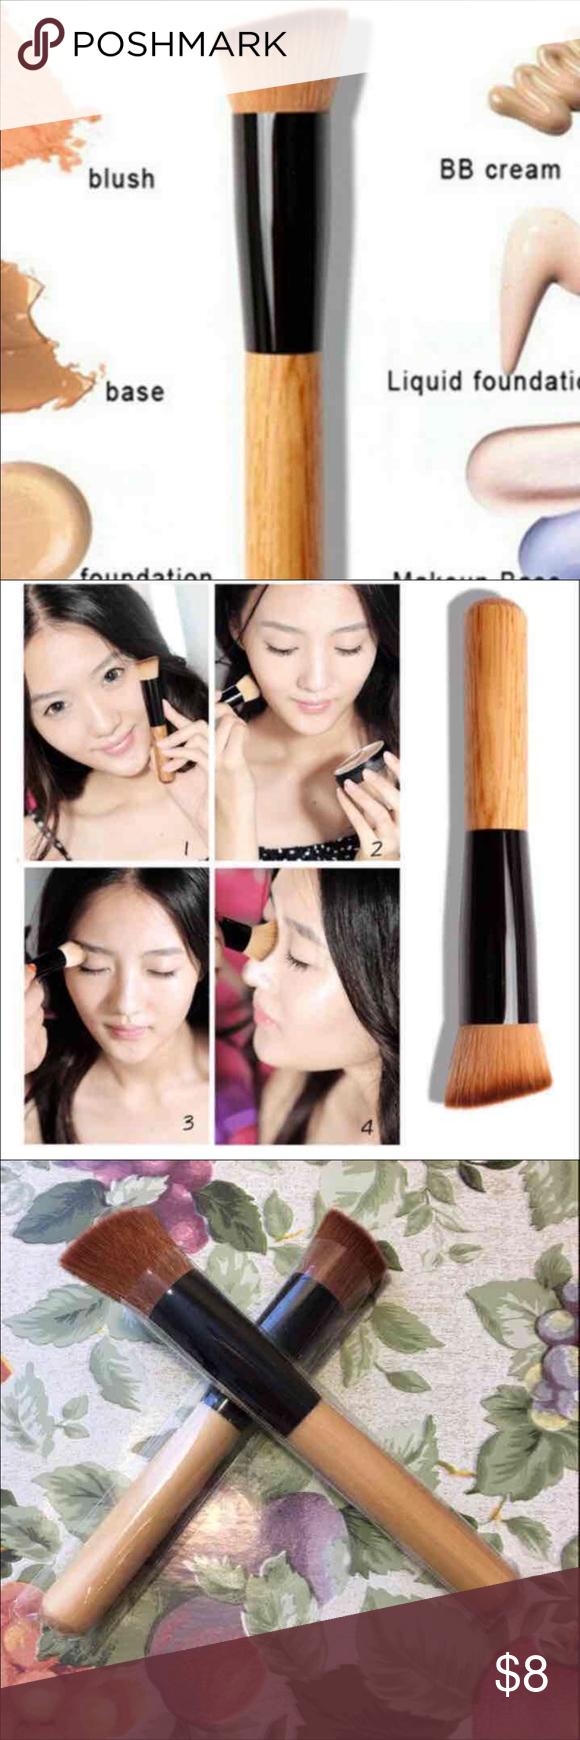 New 2pcs makeup brushes 2pcs Flat Top Foundation Angled